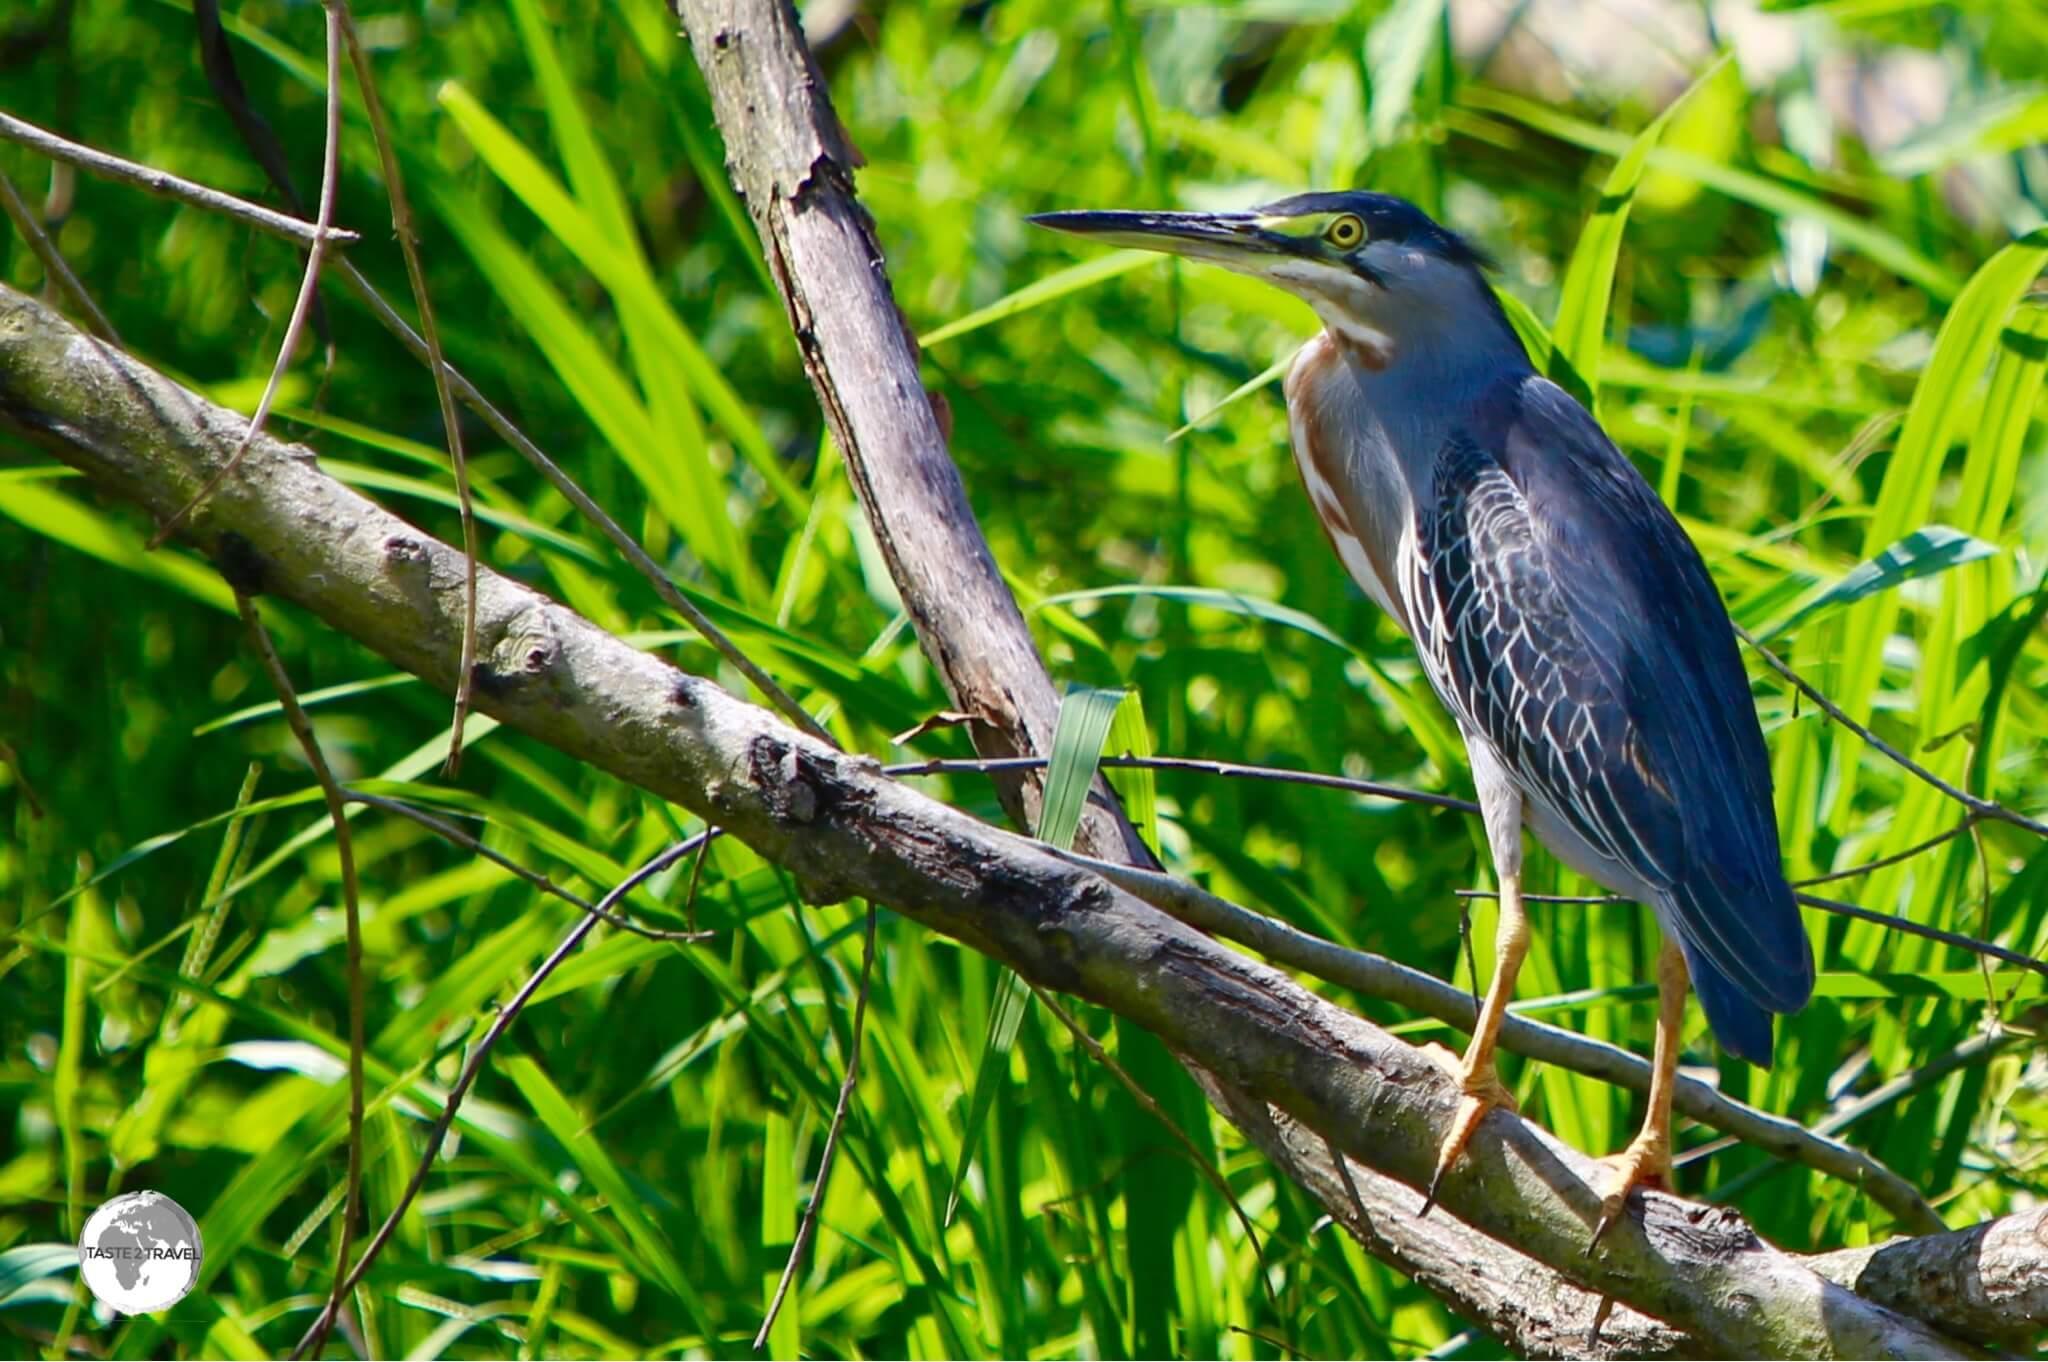 Black-crowned Night Heron on Wakenaam island.